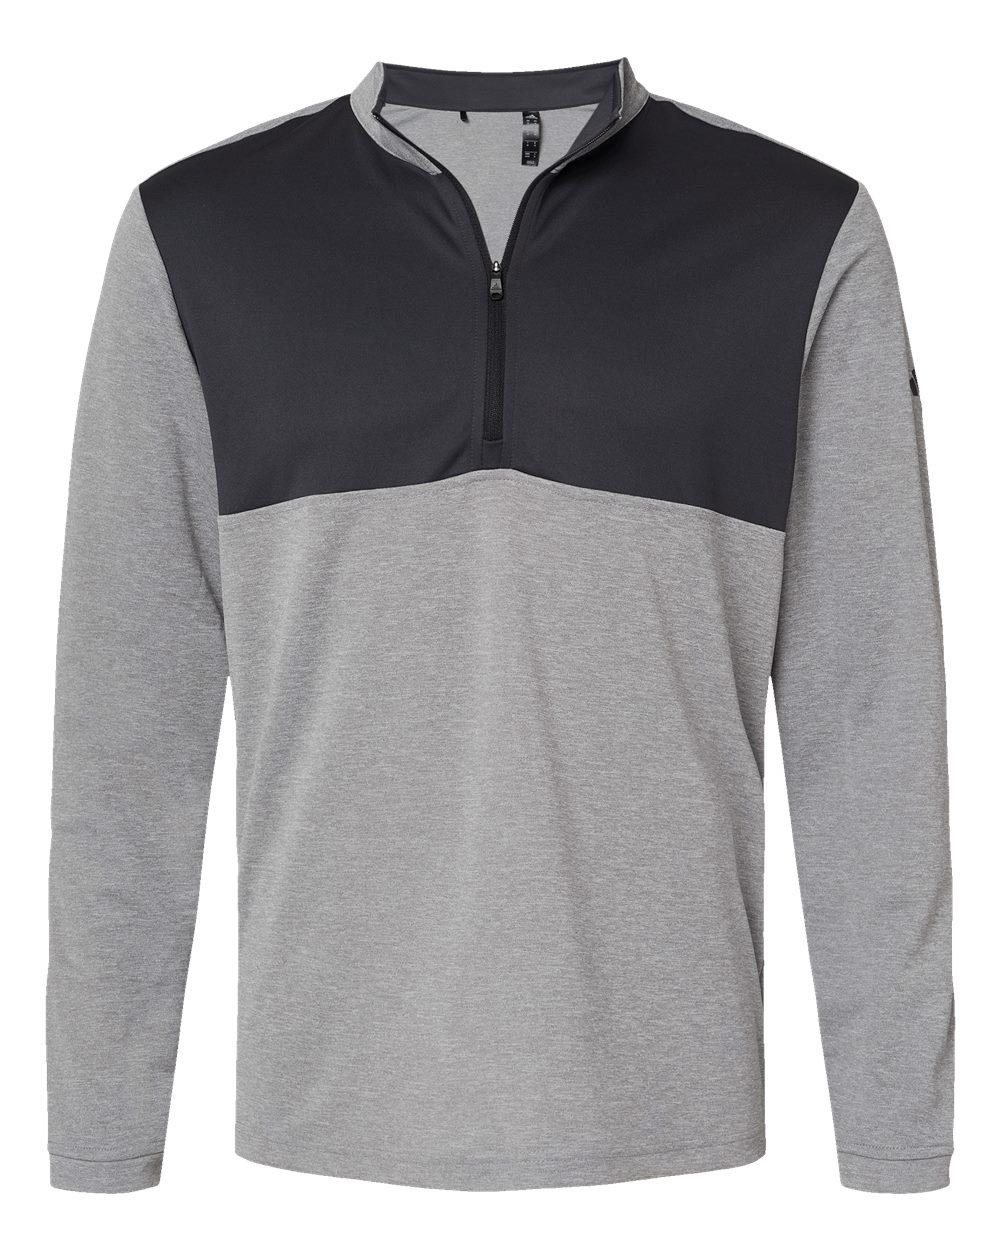 Adidas-Mens-Lightweight-UPF-pullover-Shirt-Warmup-A280-up-to-4XL thumbnail 15